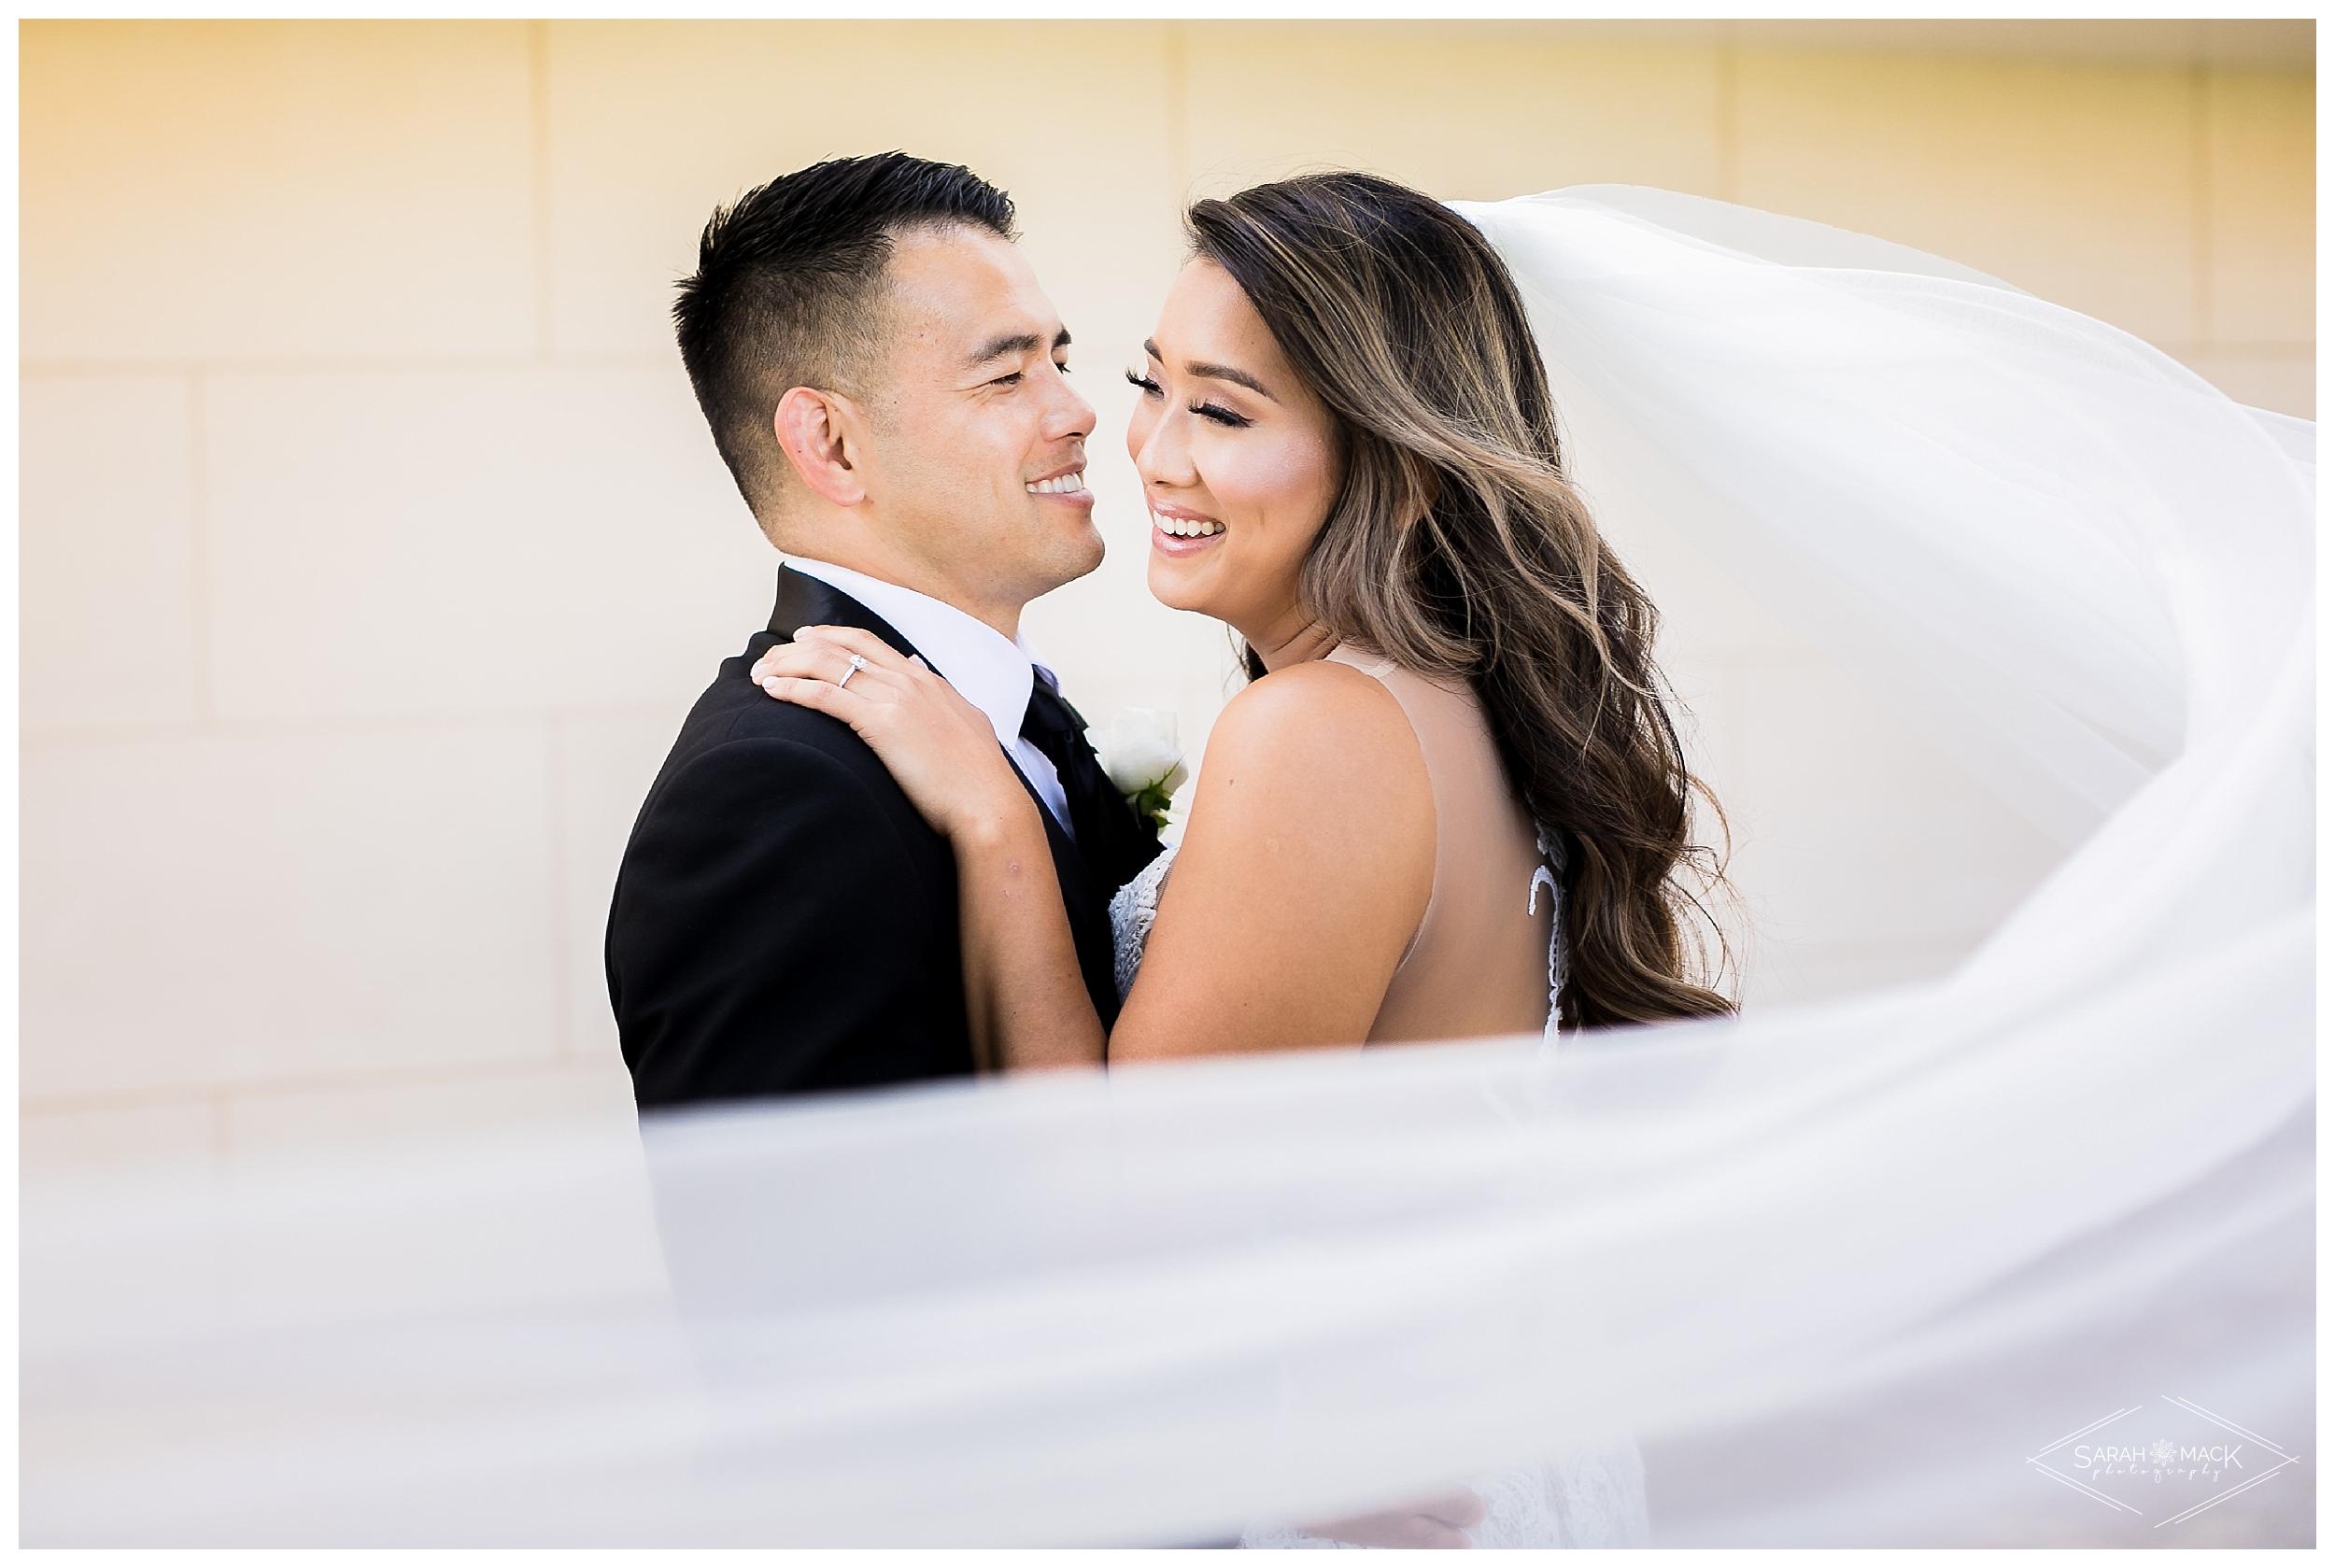 LE-Avenue-of-the-Arts-Costa-Mesa-Wedding-Photography-0118.jpg